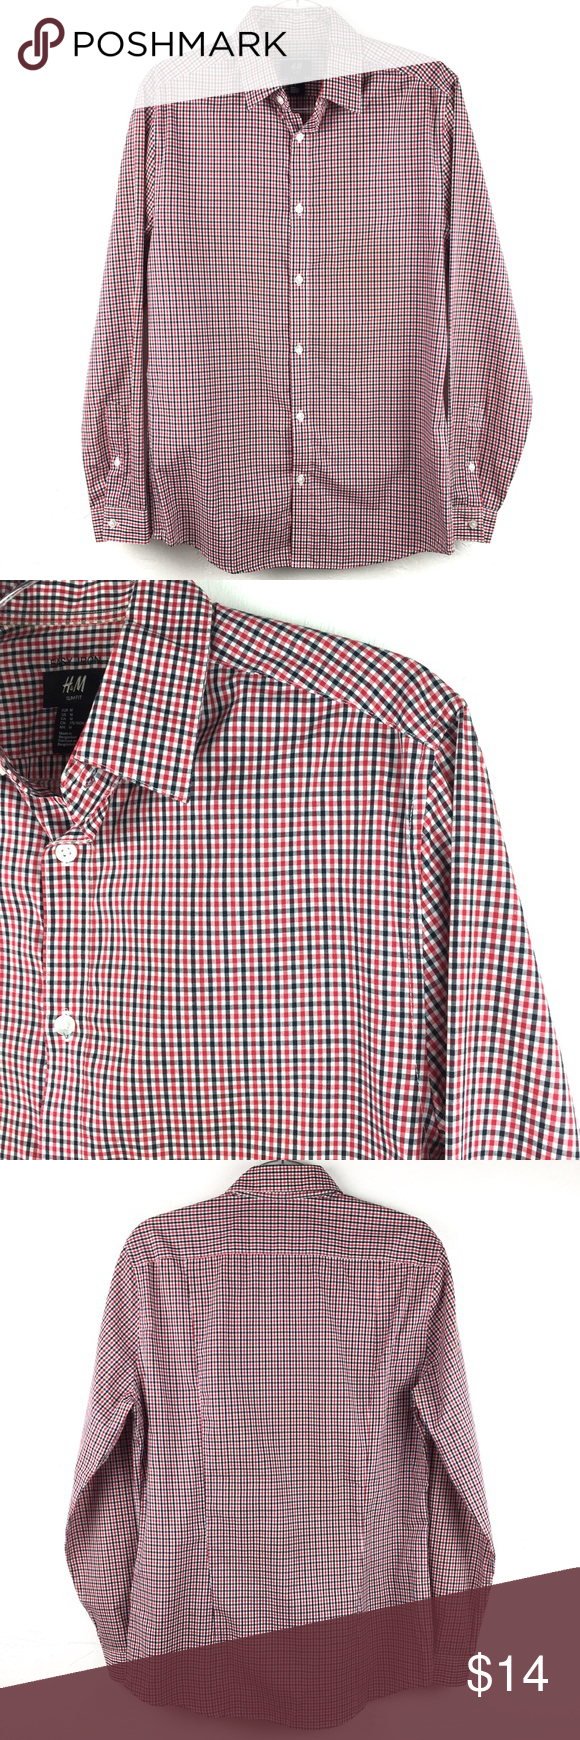 0eb3a67a122a Men's H&M Red Black White Gingham Plaid Shirt Men's H&M Red Black